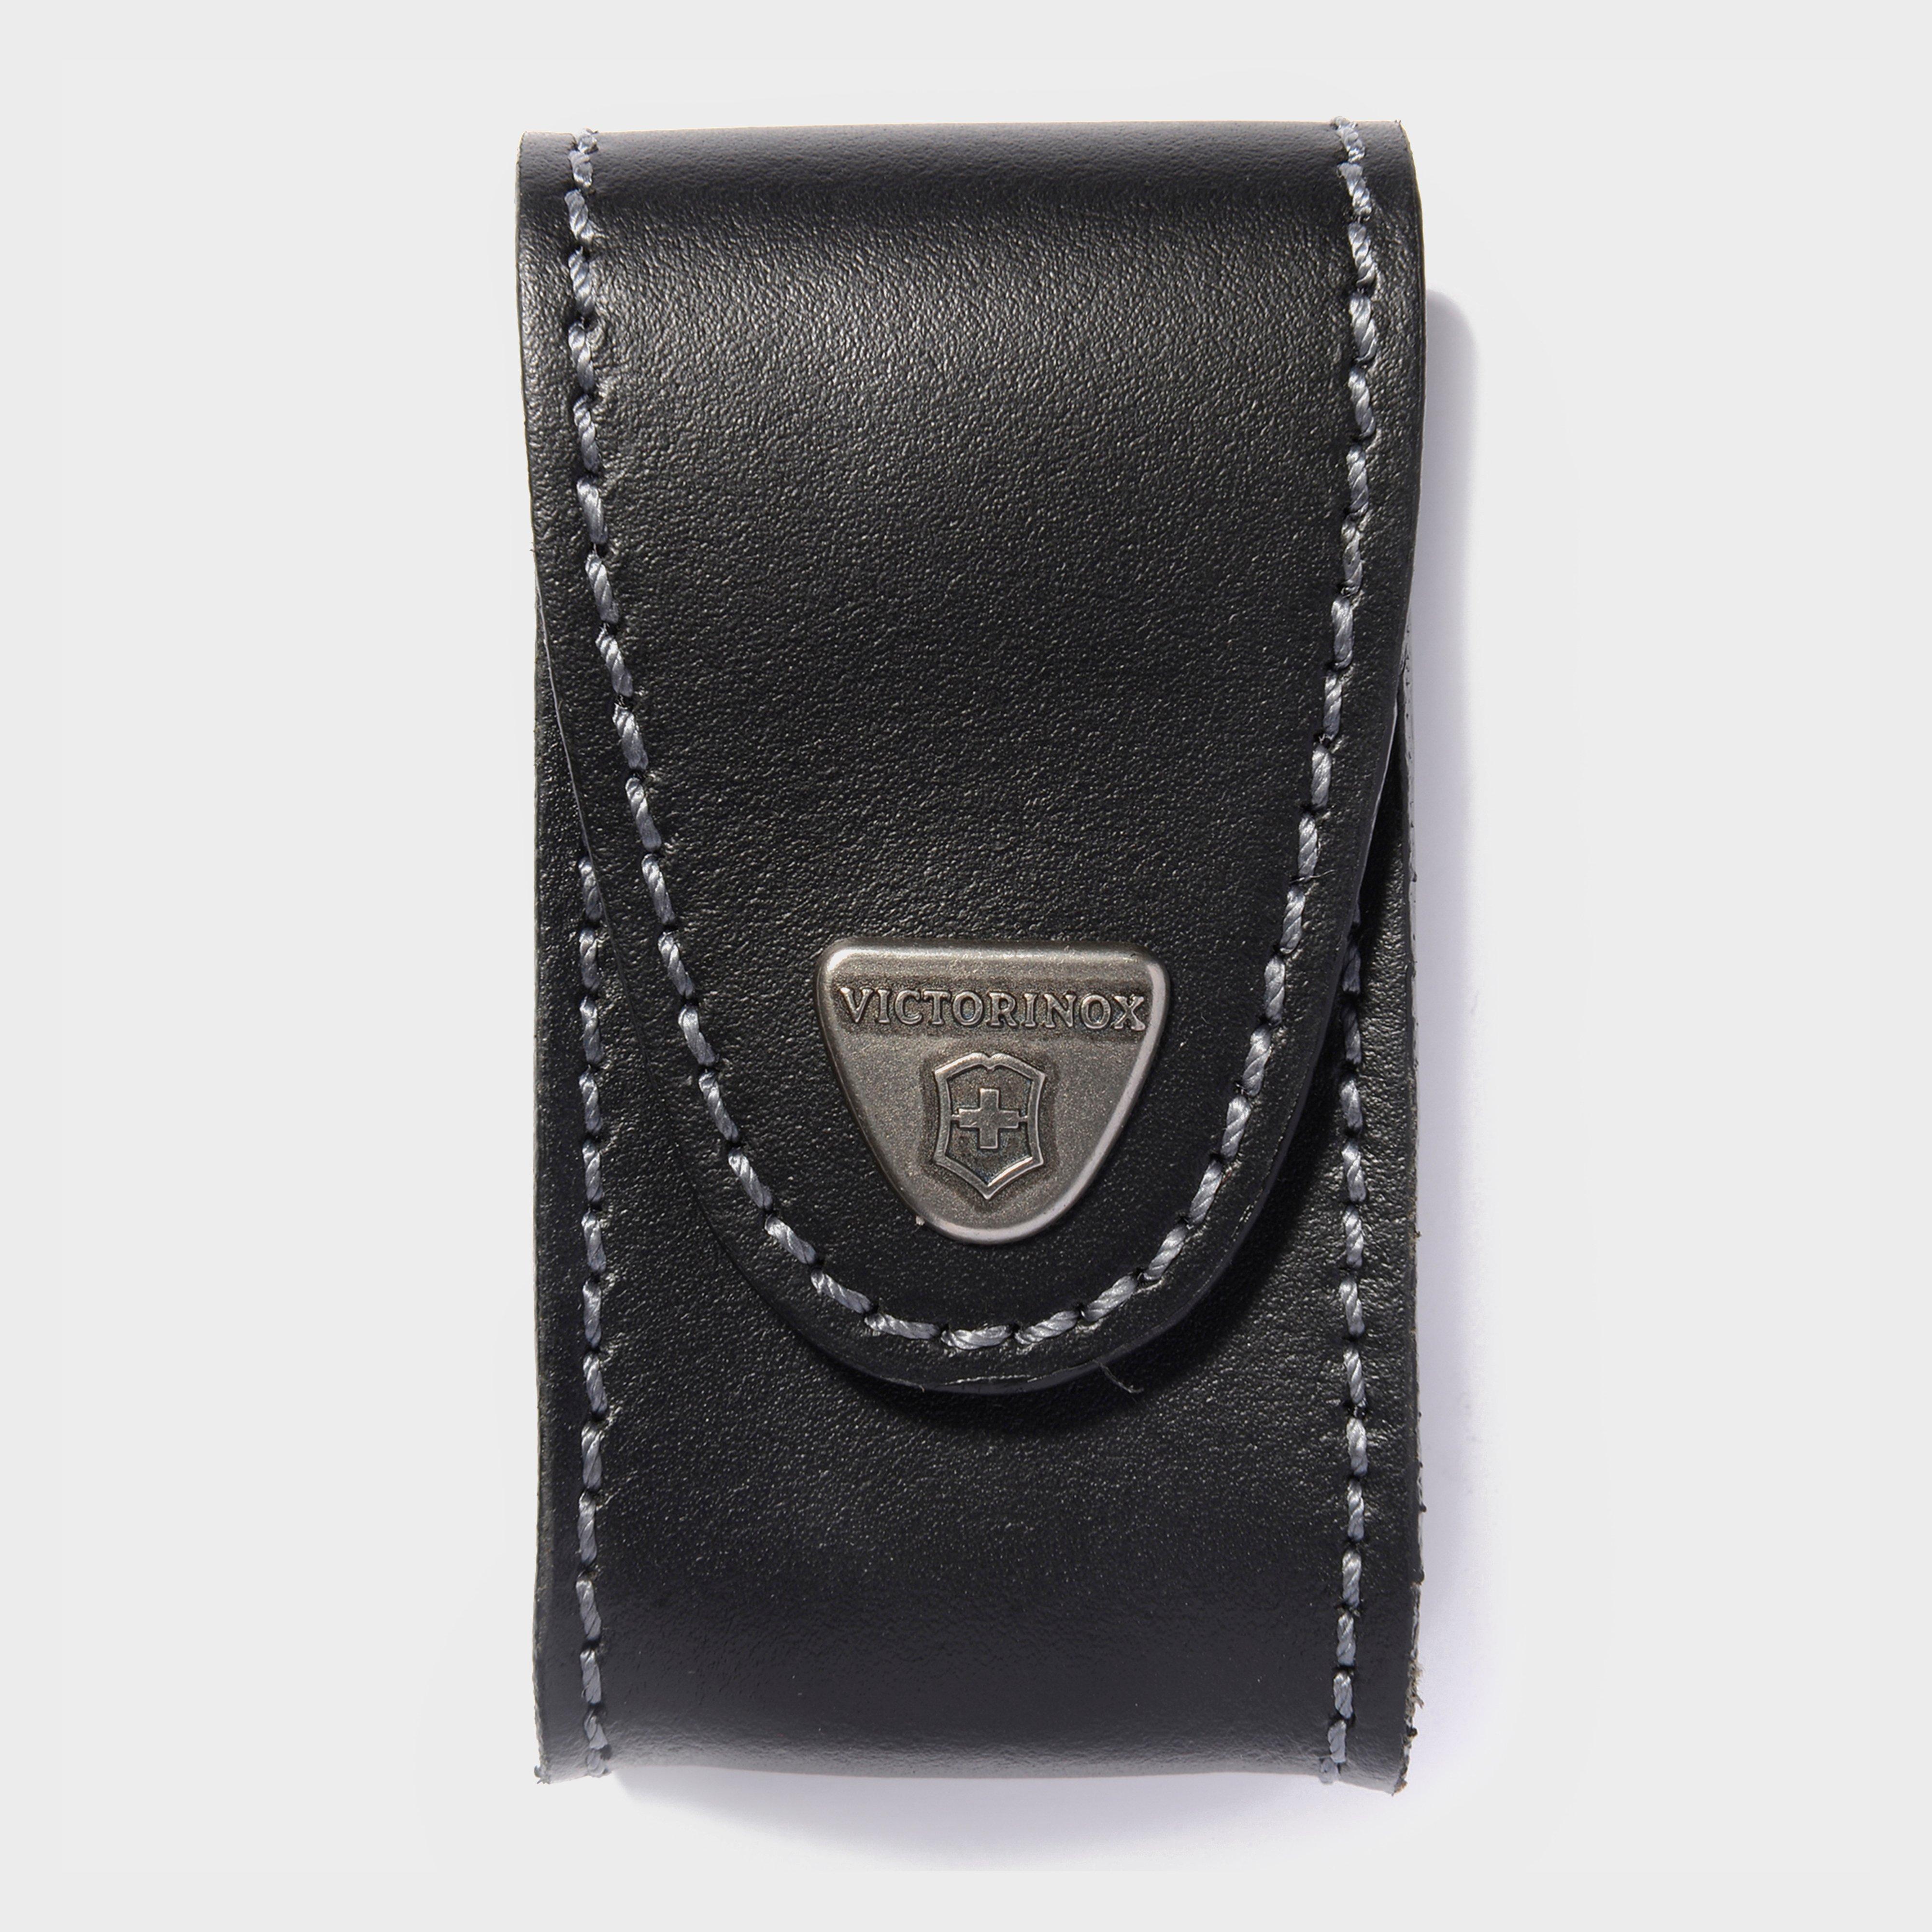 Victorinox Pocket Knife Leather Belt Pouch 5-8 Layers - Black/blk  Black/blk